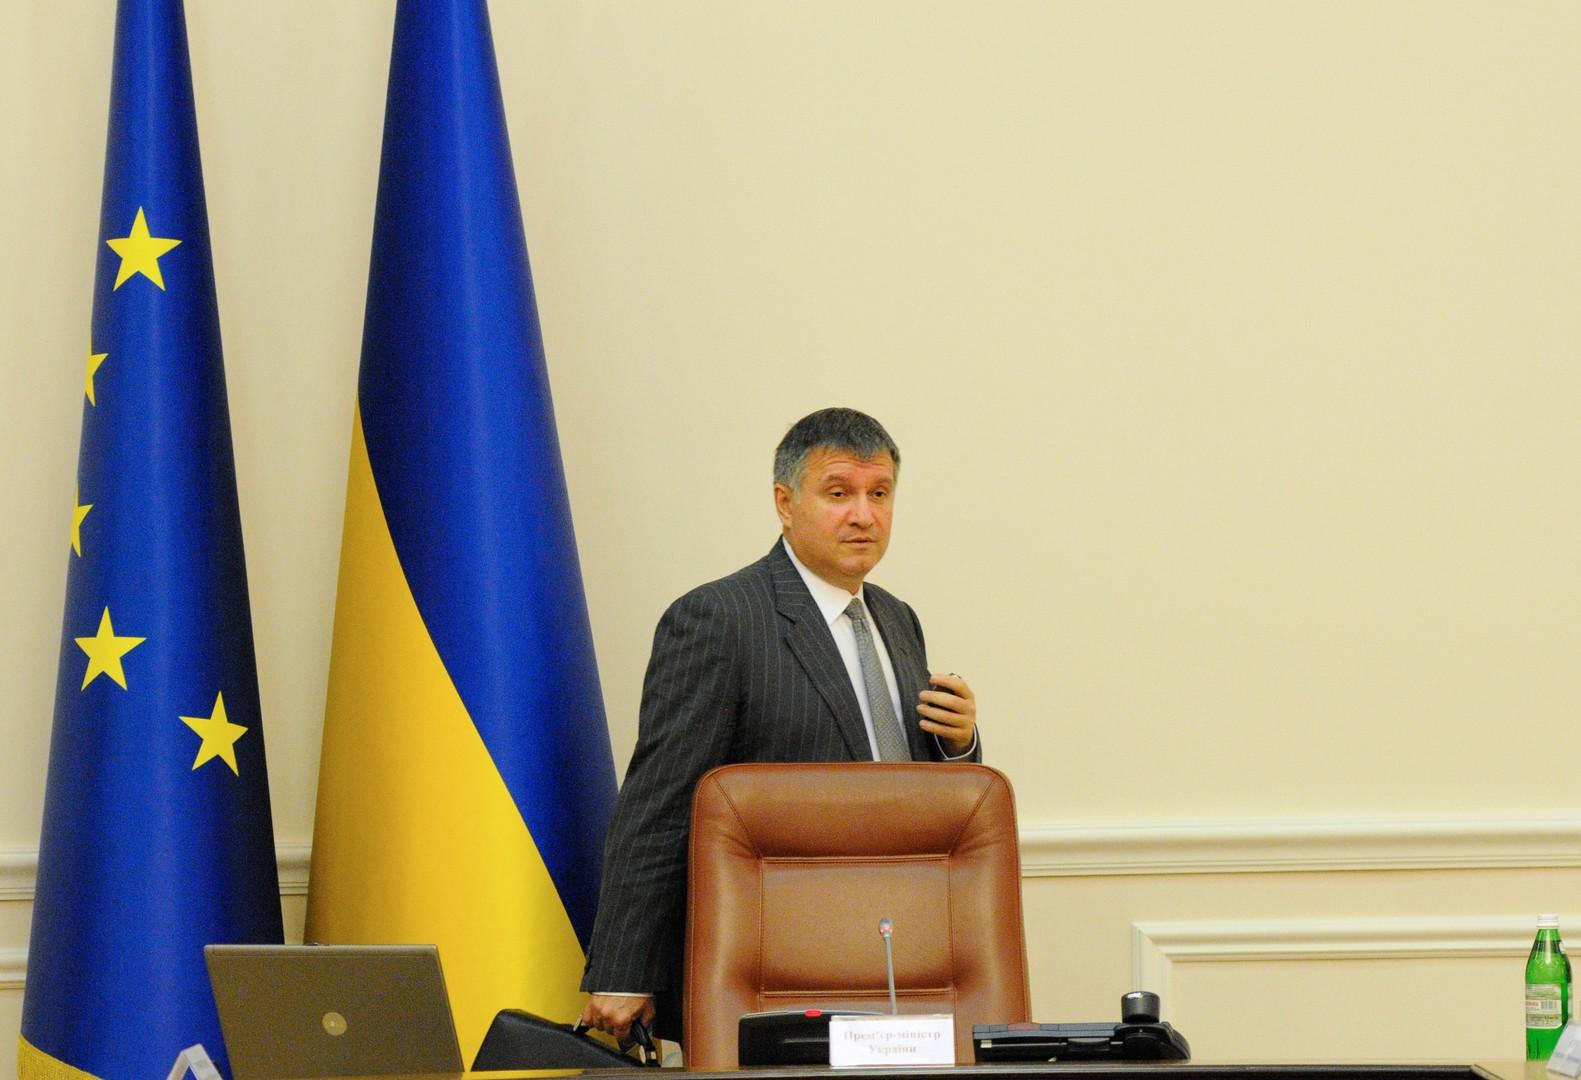 Ukrainischer Innenminister Arsen Awakow